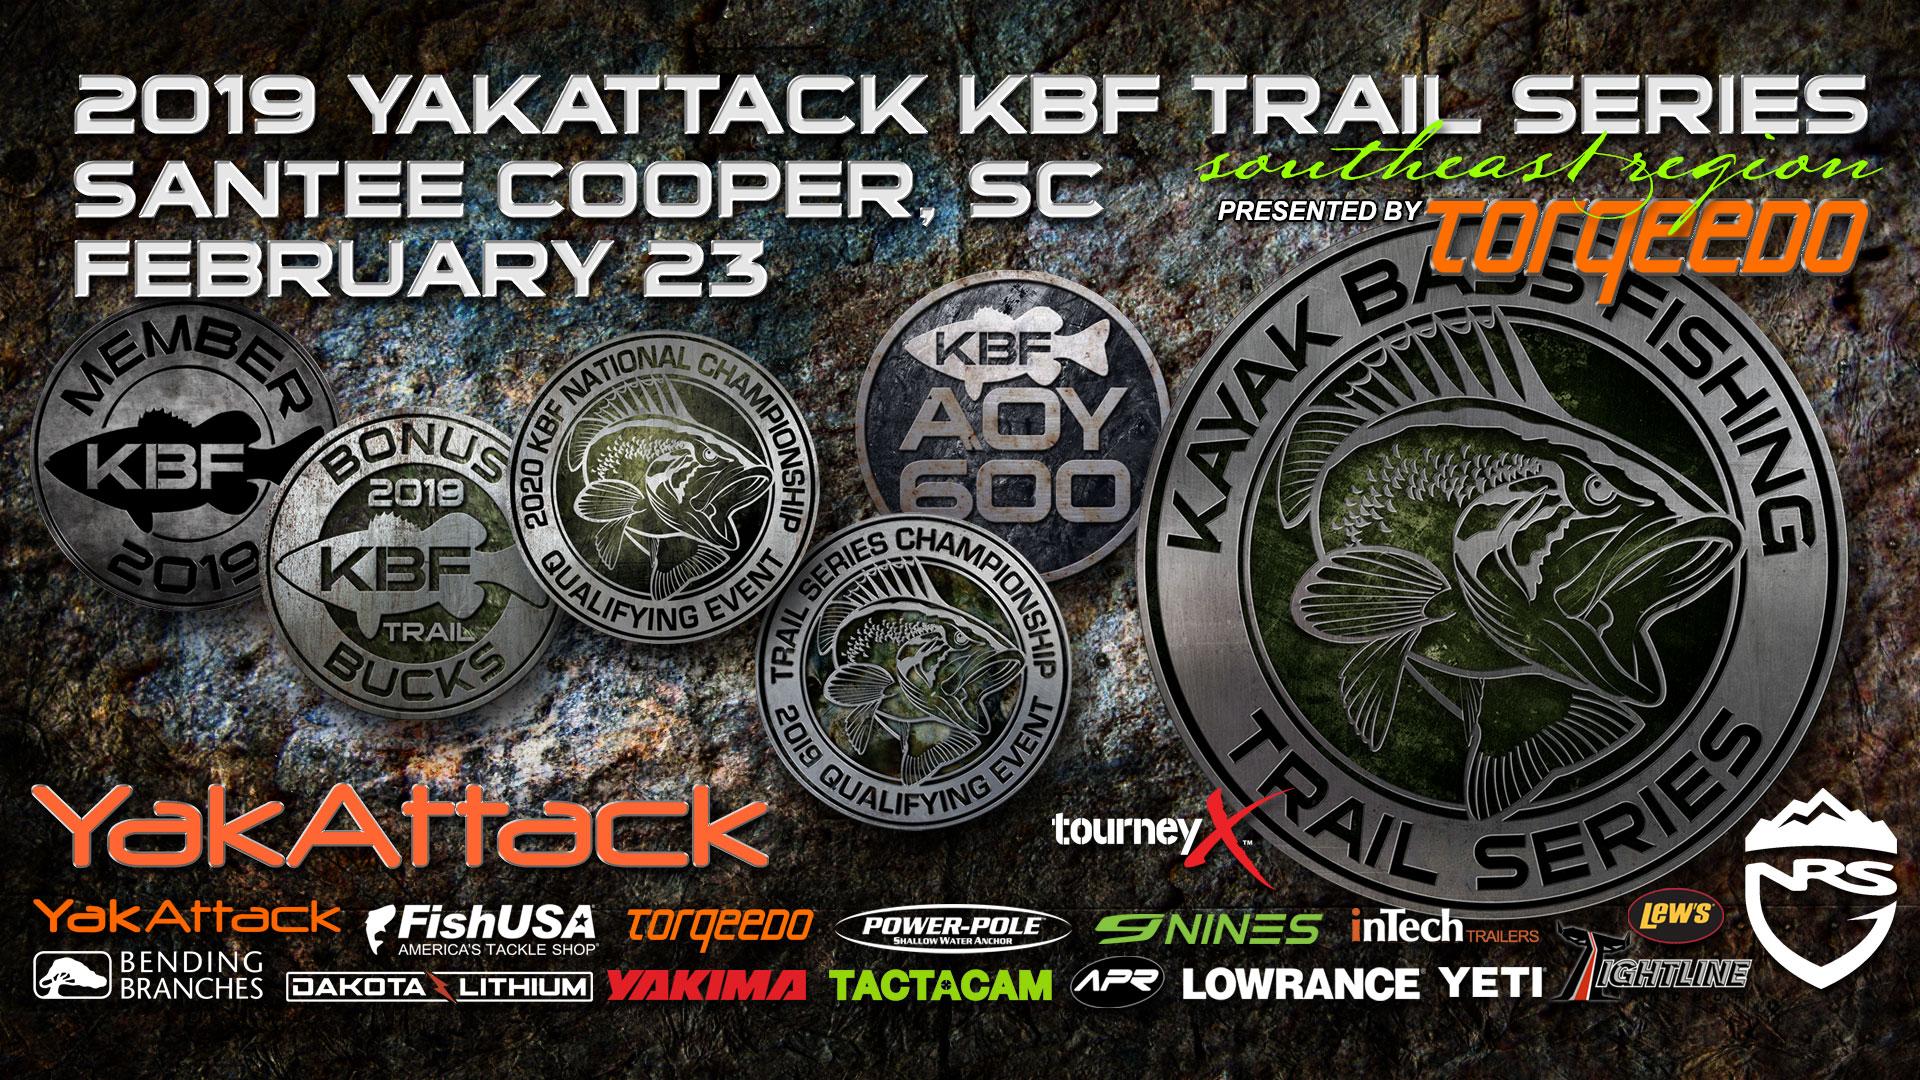 2019 YakAttack KBF TRAIL Santee Cooper SC   Kayak Bass Fishing